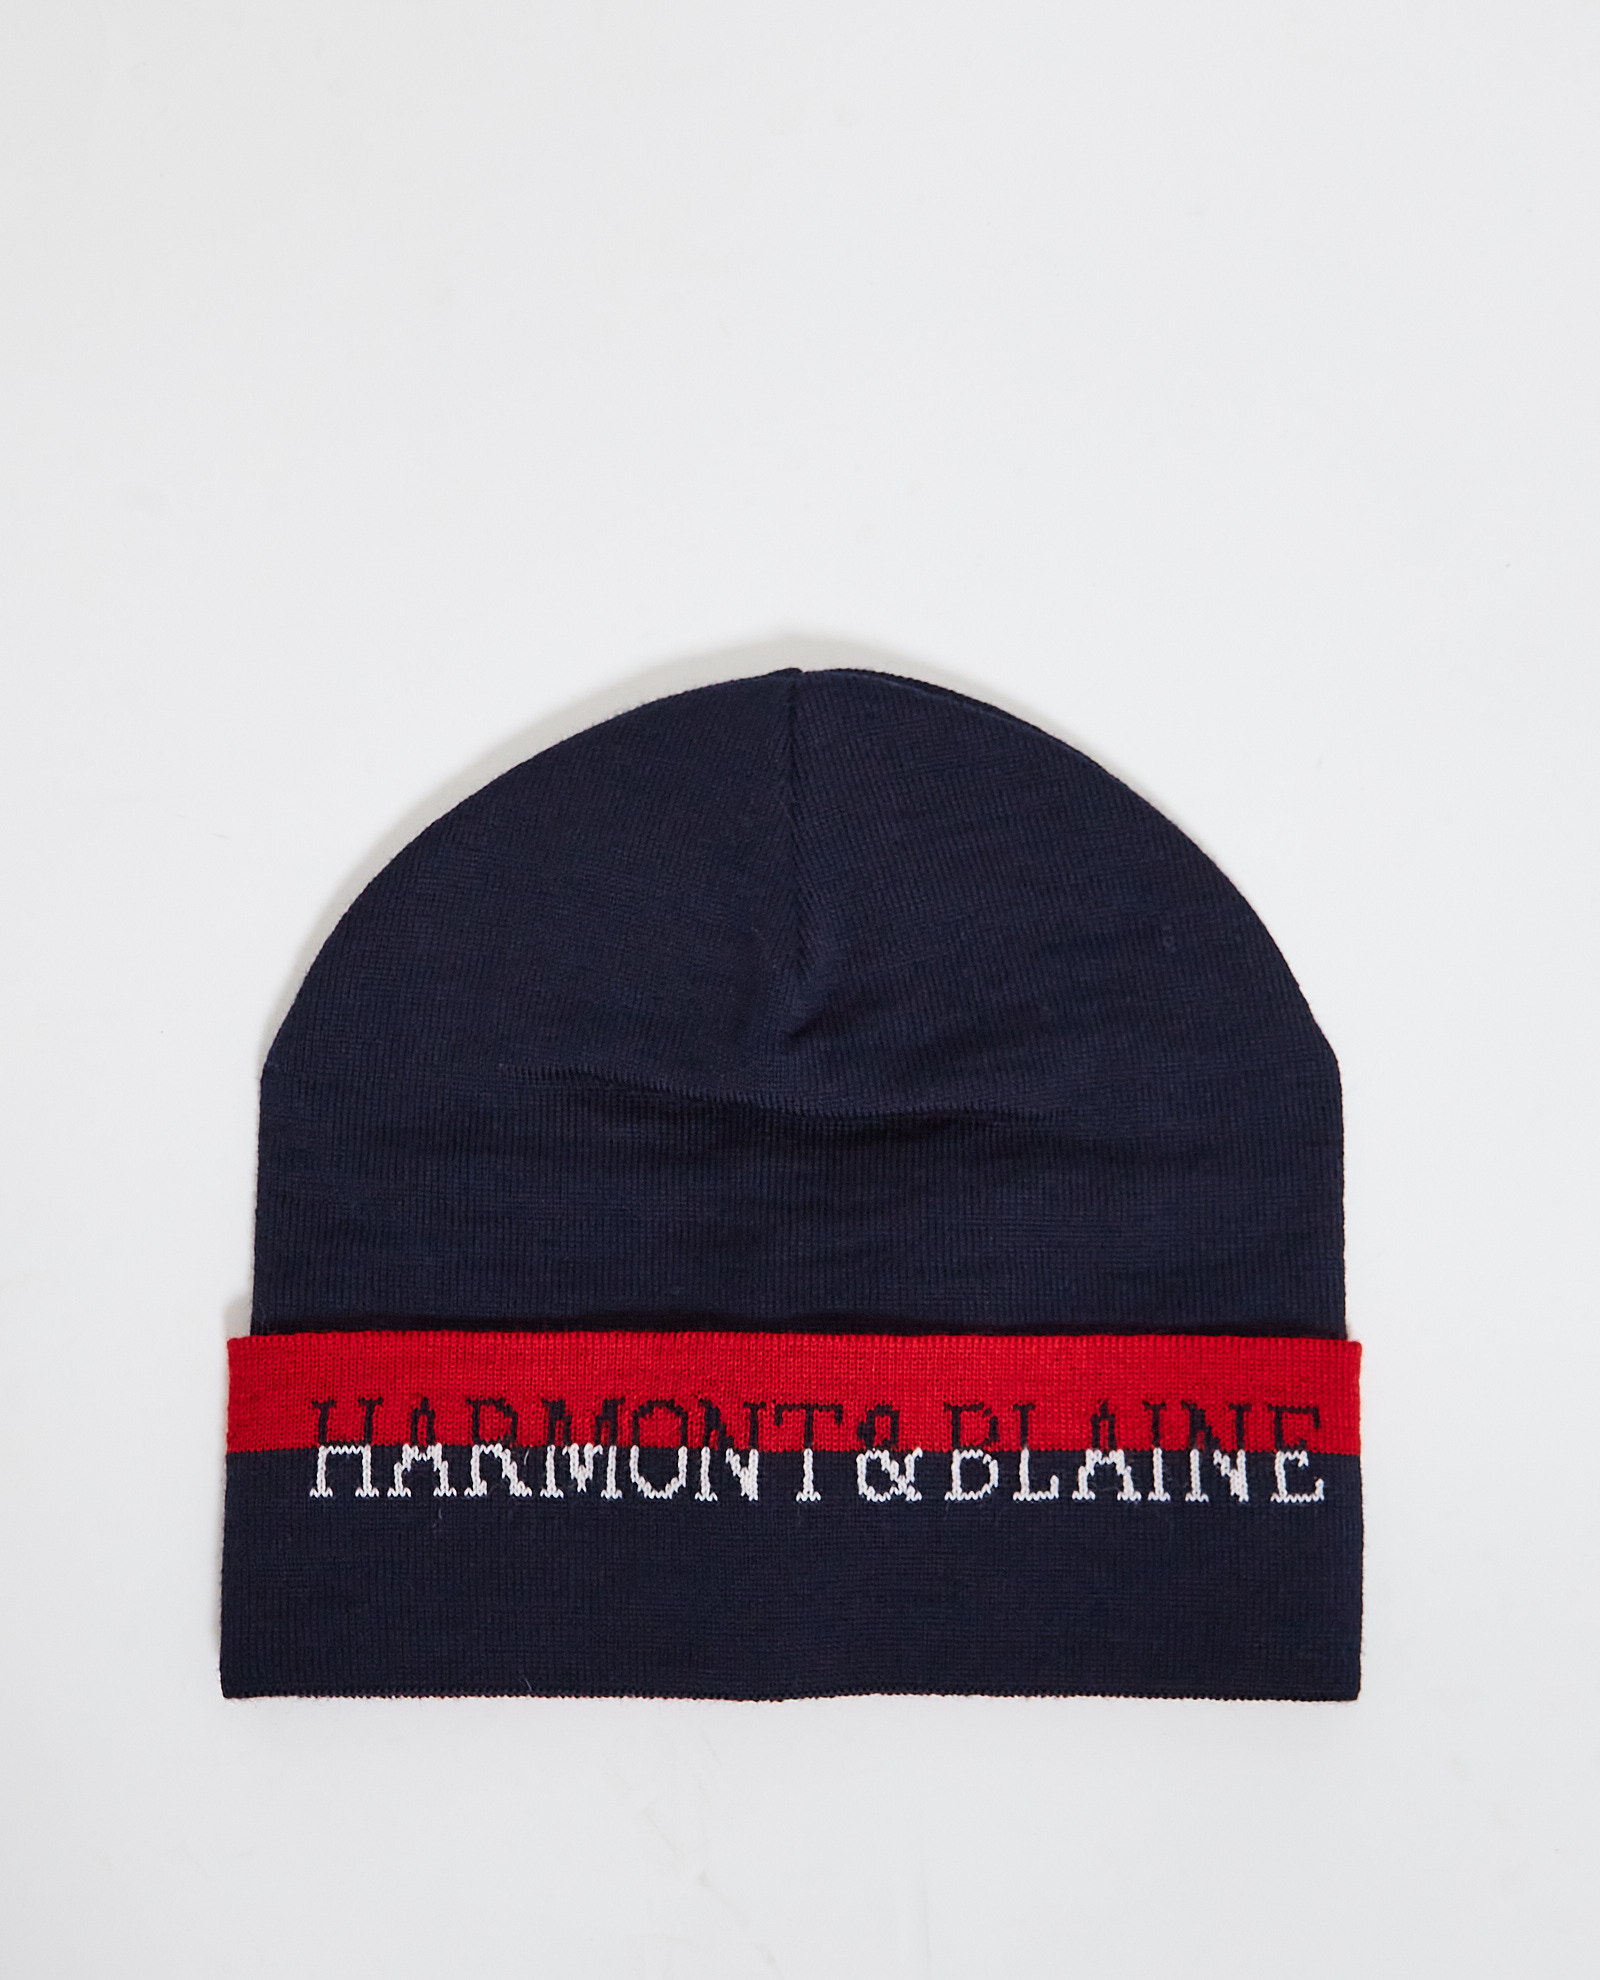 Cappello in lana Harmont and blaine HARMONT & BLAINE   Cappello   N0G068030798801